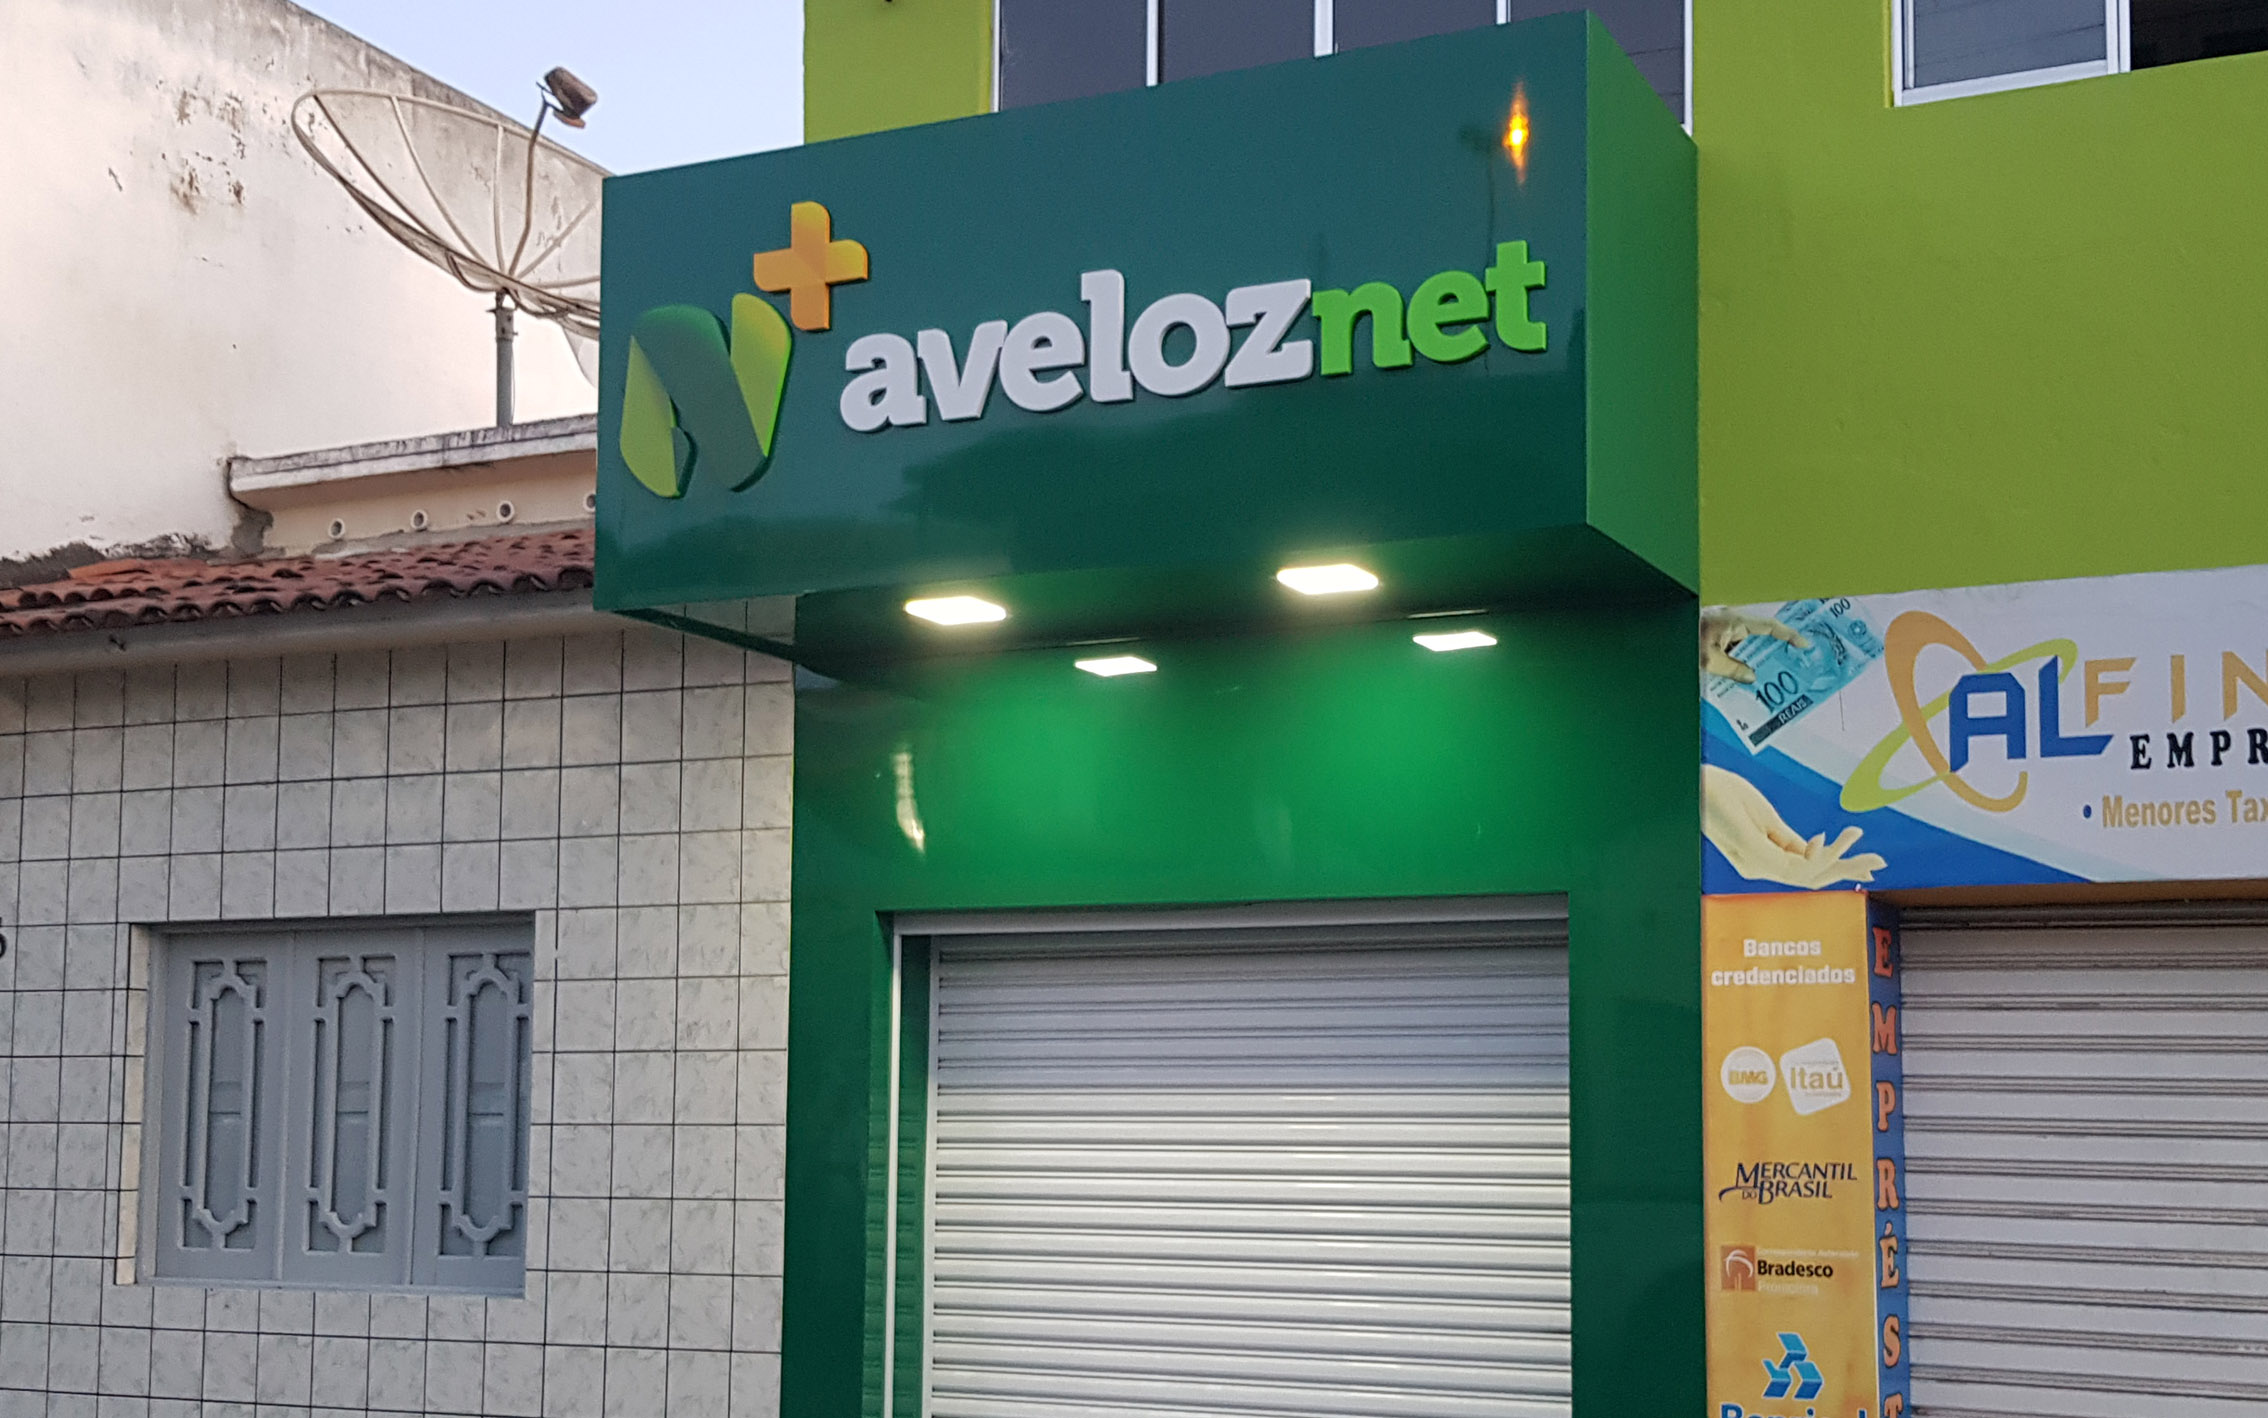 https://0201.nccdn.net/4_2/000/000/04d/add/atelier2---aveloz-net-1.jpg